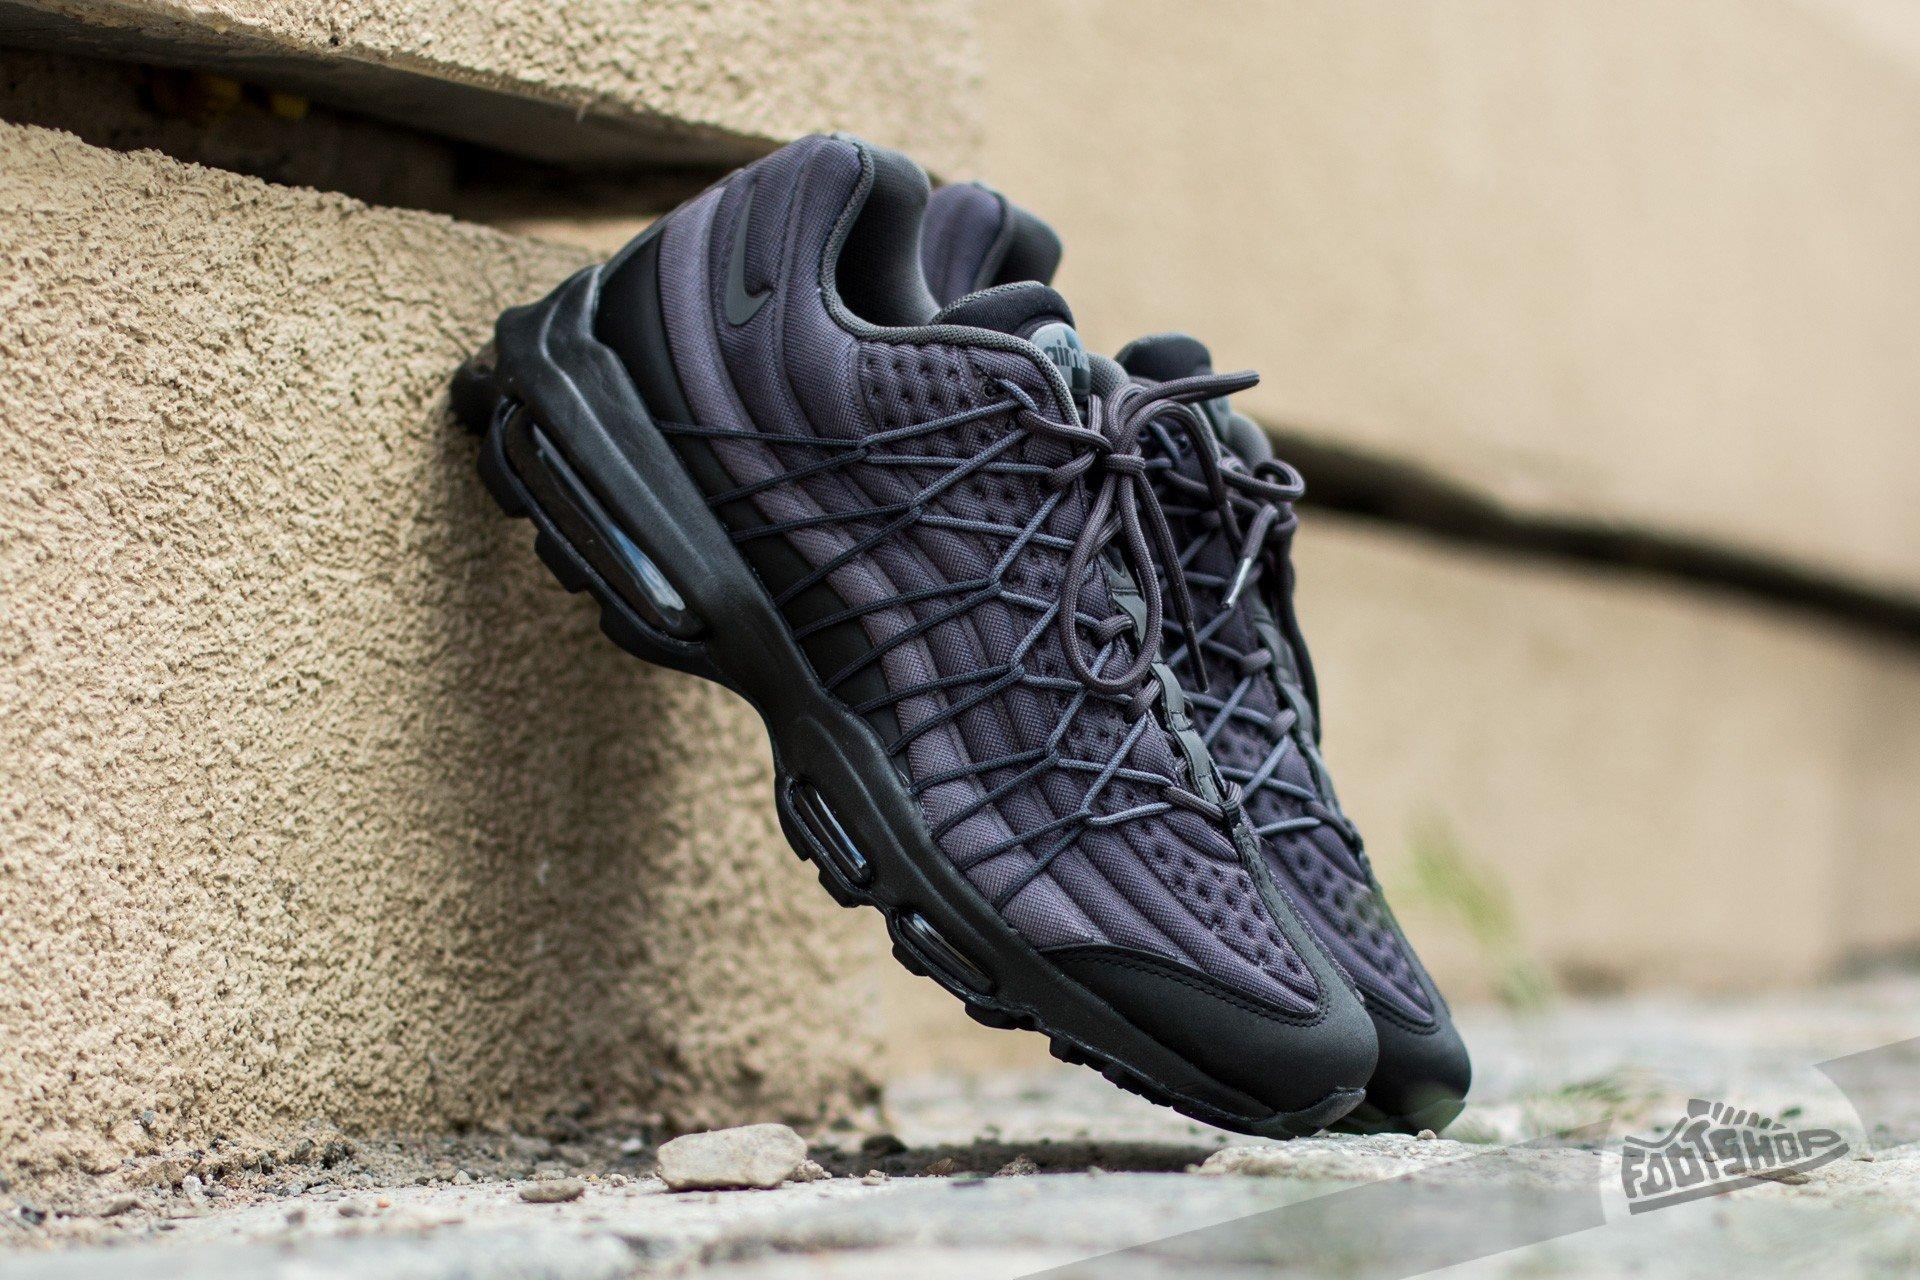 online store 0361e f1fd6 Nike Air Max 95 Ultra Se Black  Dark Grey-Black-Anthracite